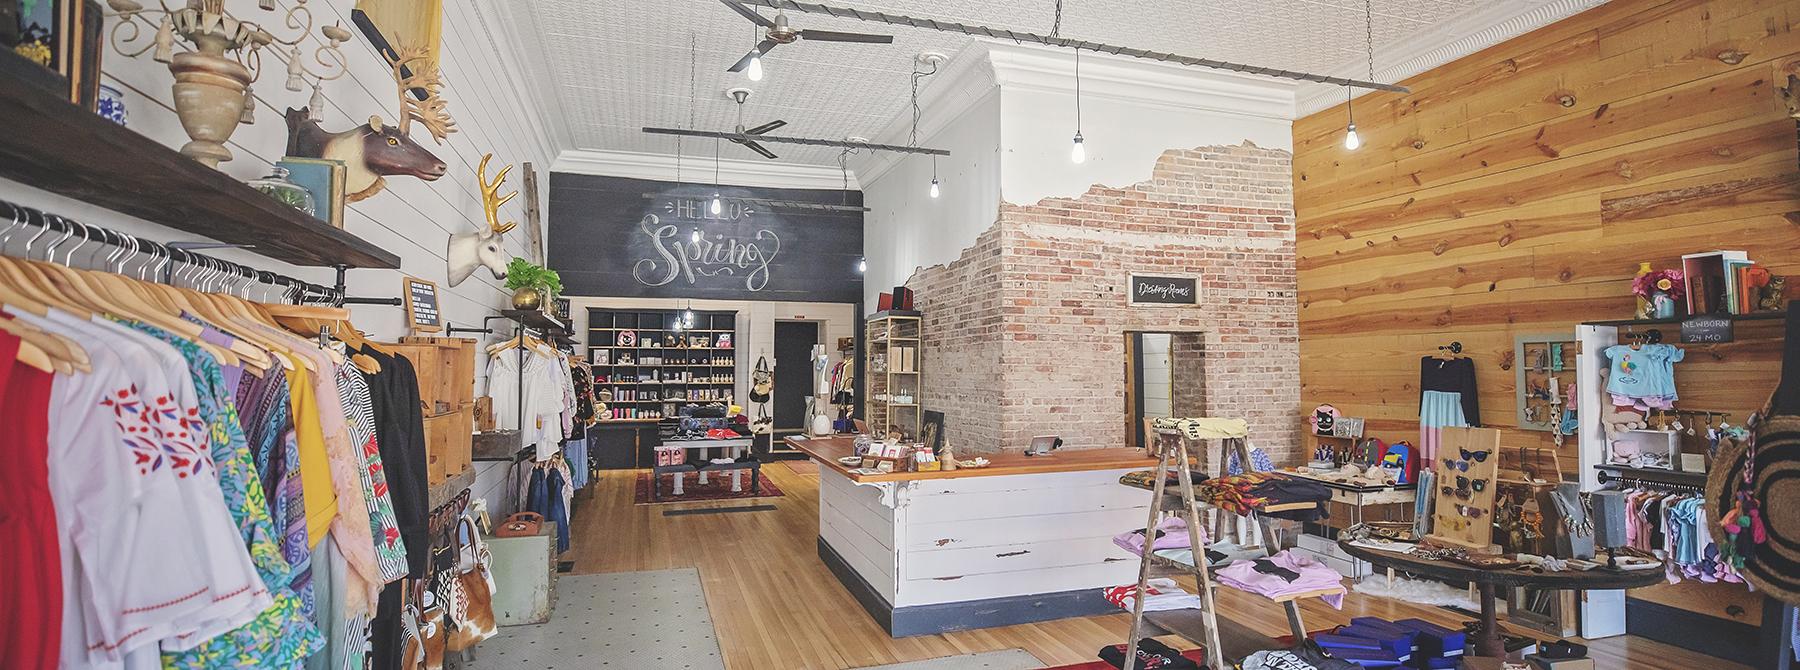 store, shop, boutique, Main Street, valentine, nebraska, neb, historic, building, bank, Nebraska State Bank, remodel, fixer upper